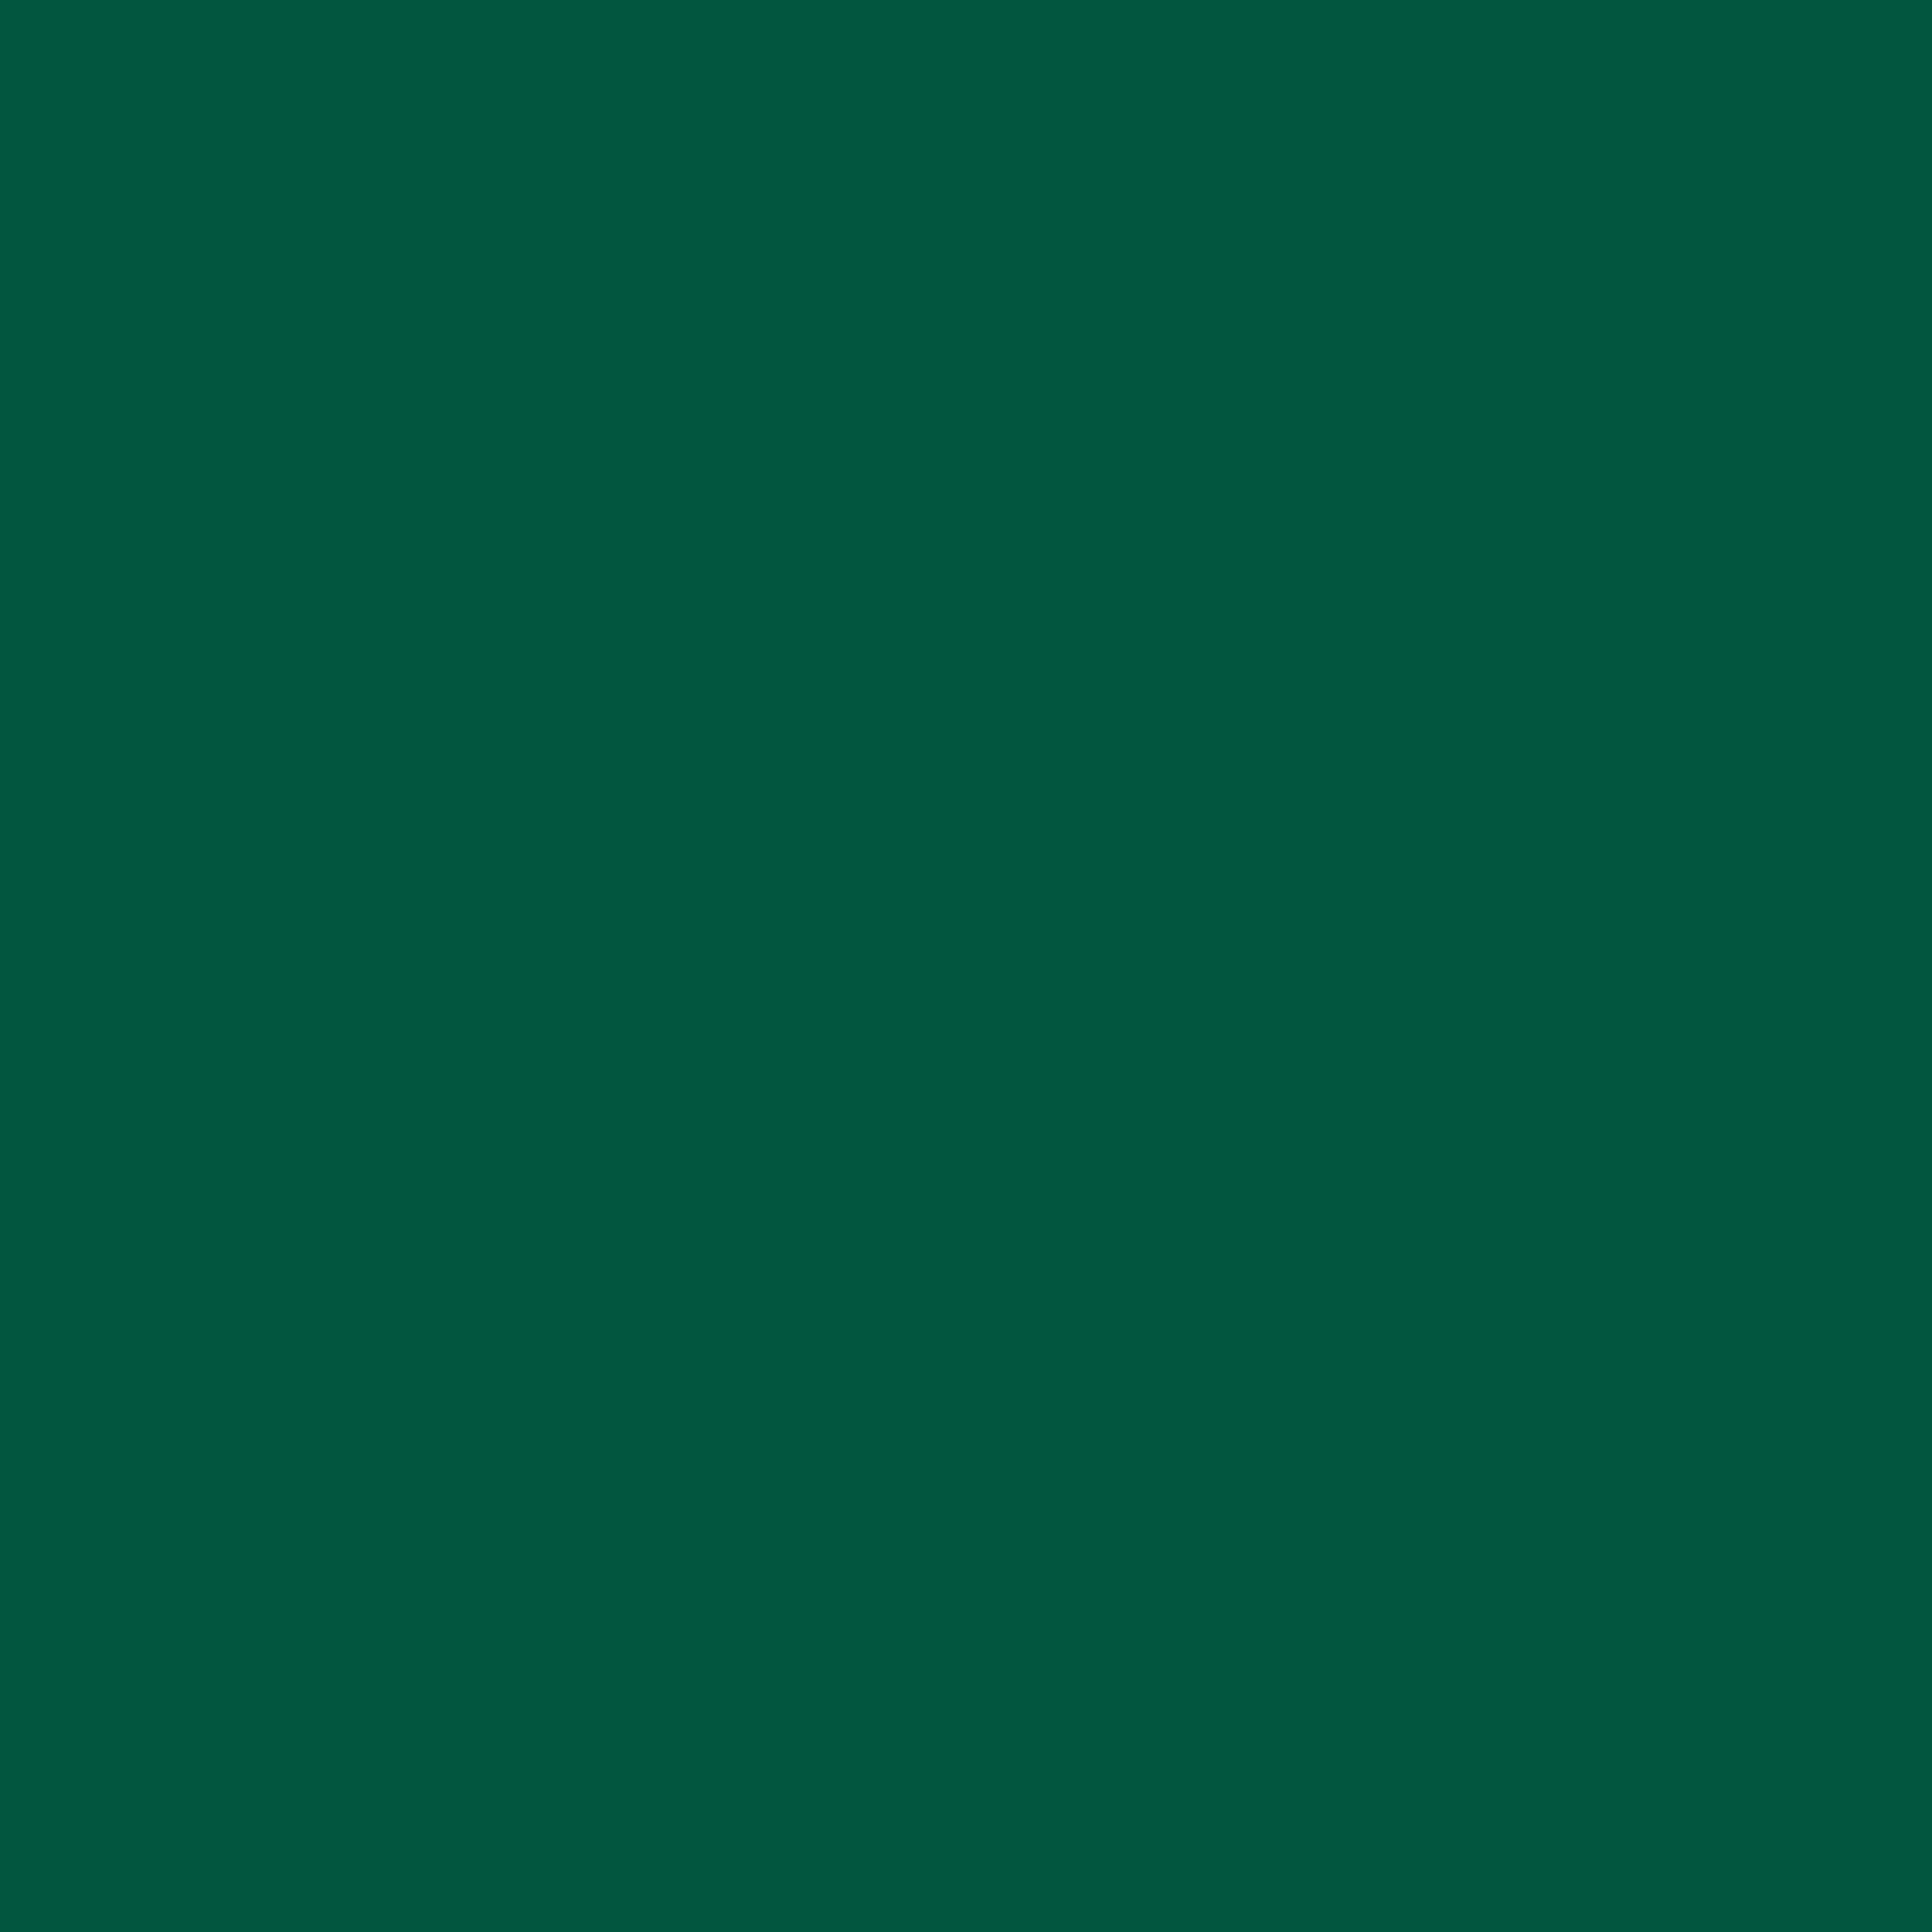 2048x2048 Castleton Green Solid Color Background